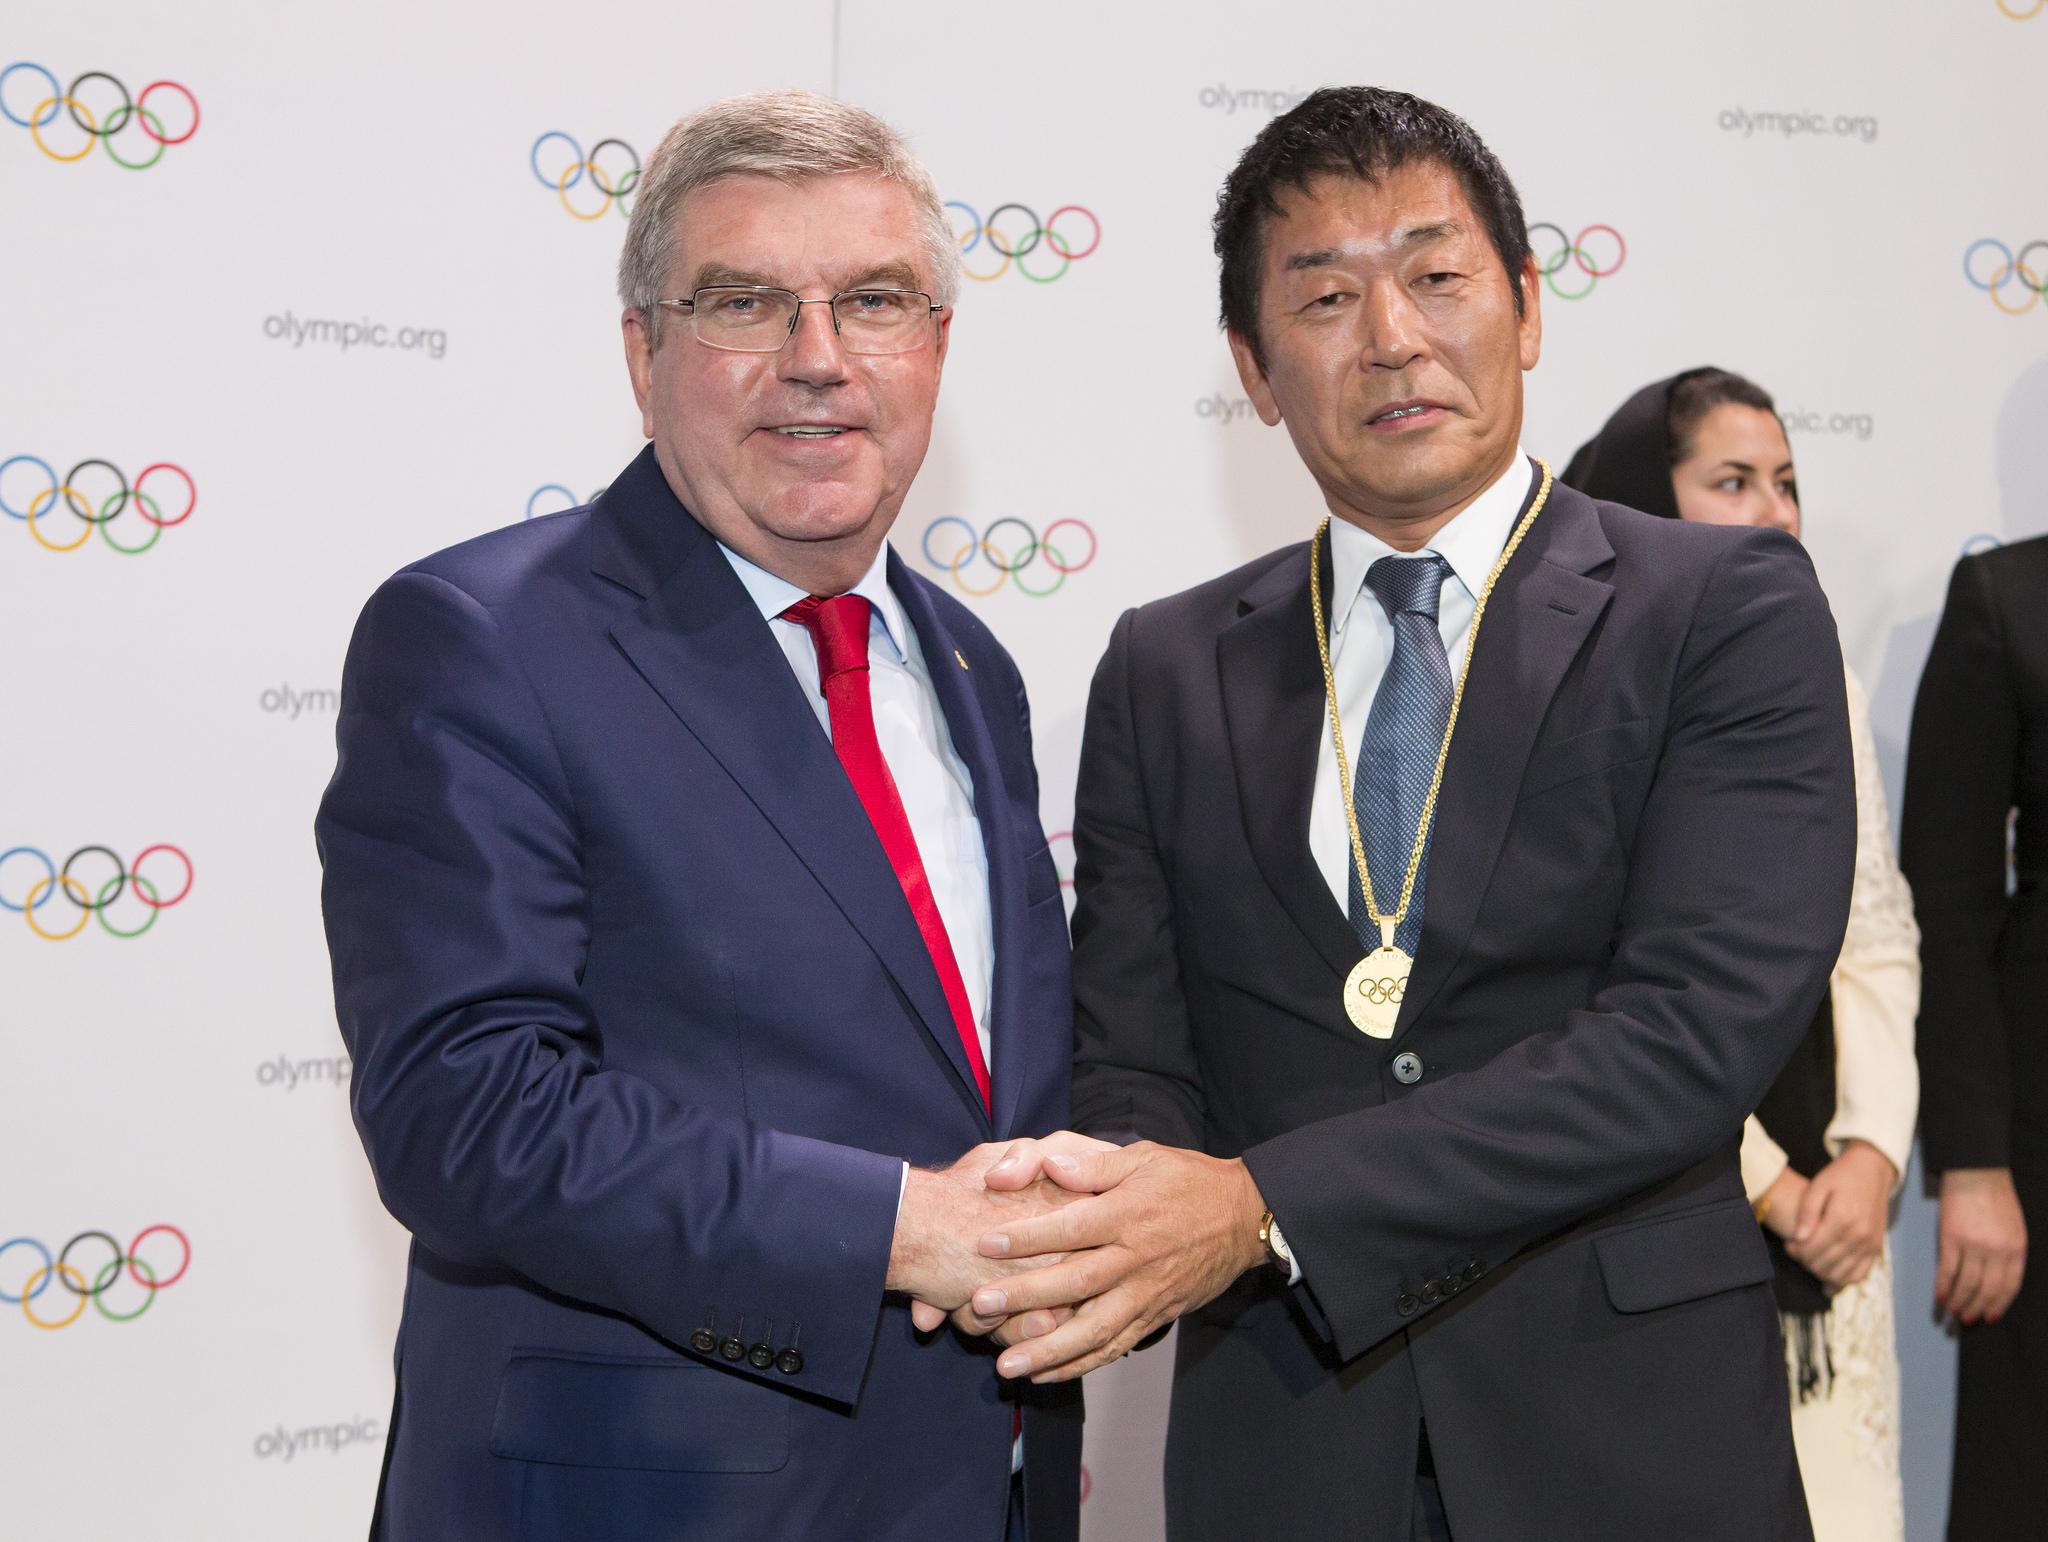 IOC president Thomas Bach with FIG president Morinari Watanabe